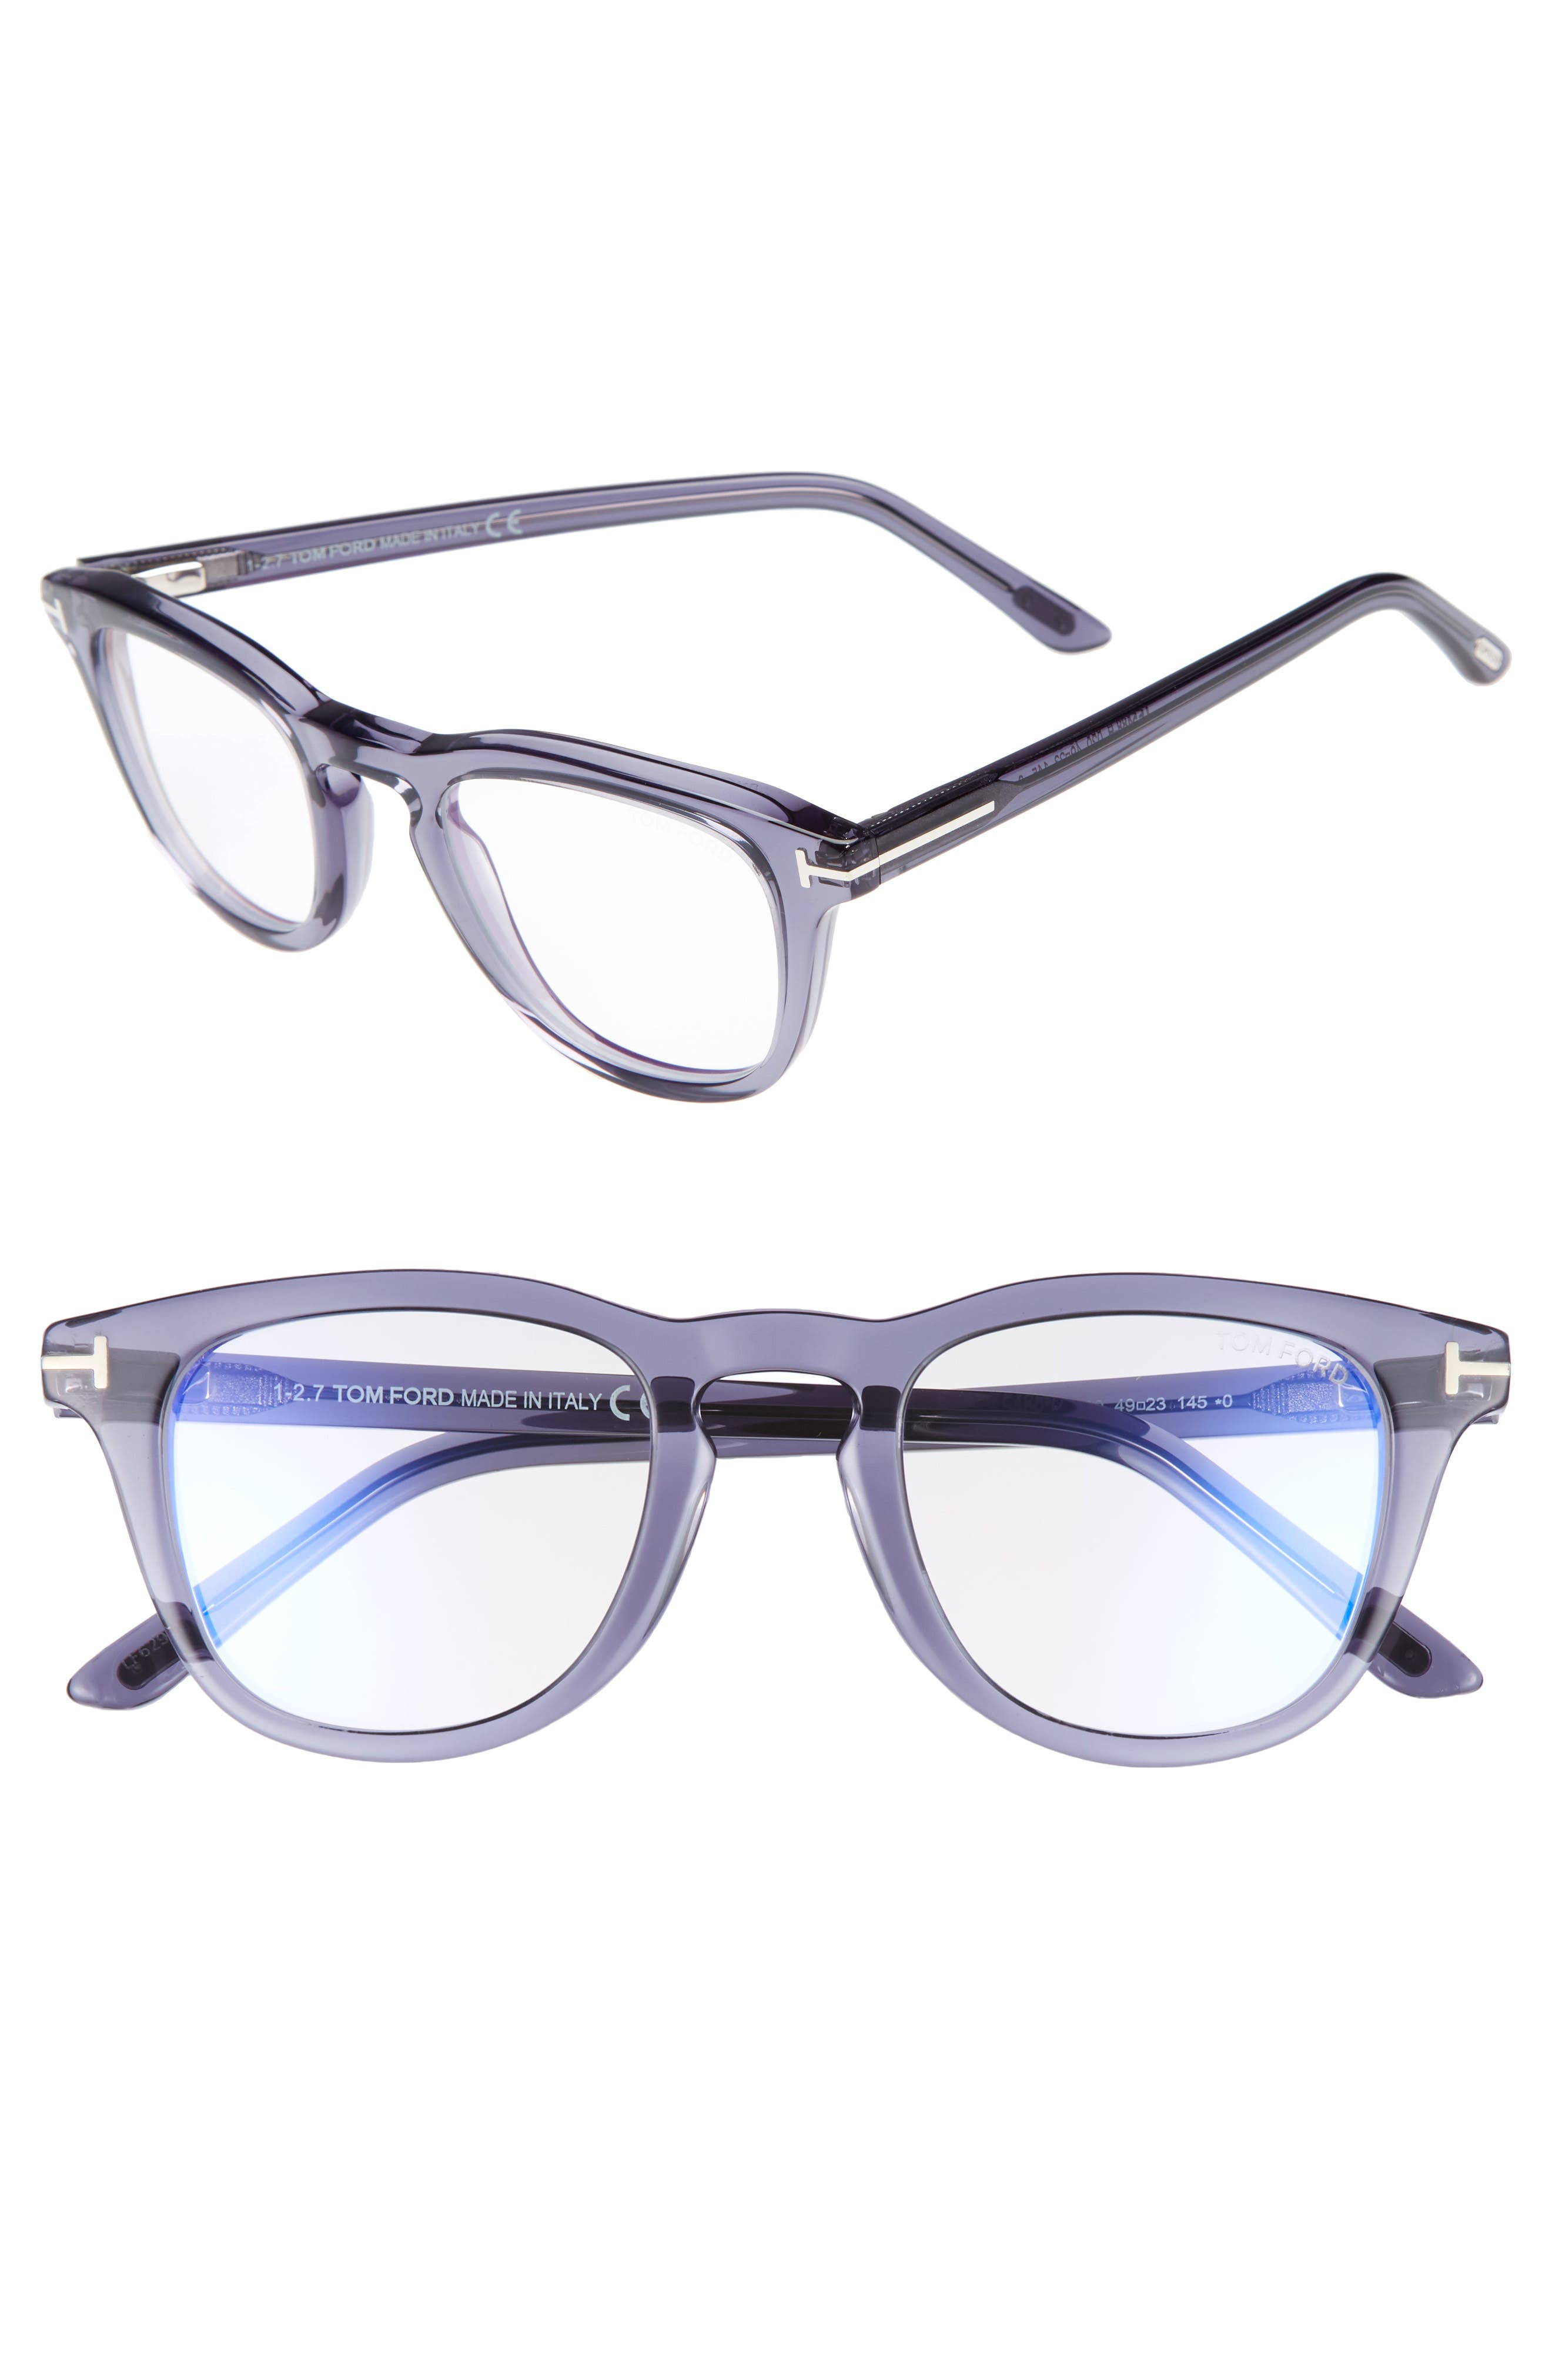 Tom Ford 49mm Blue Block Optical Glasses